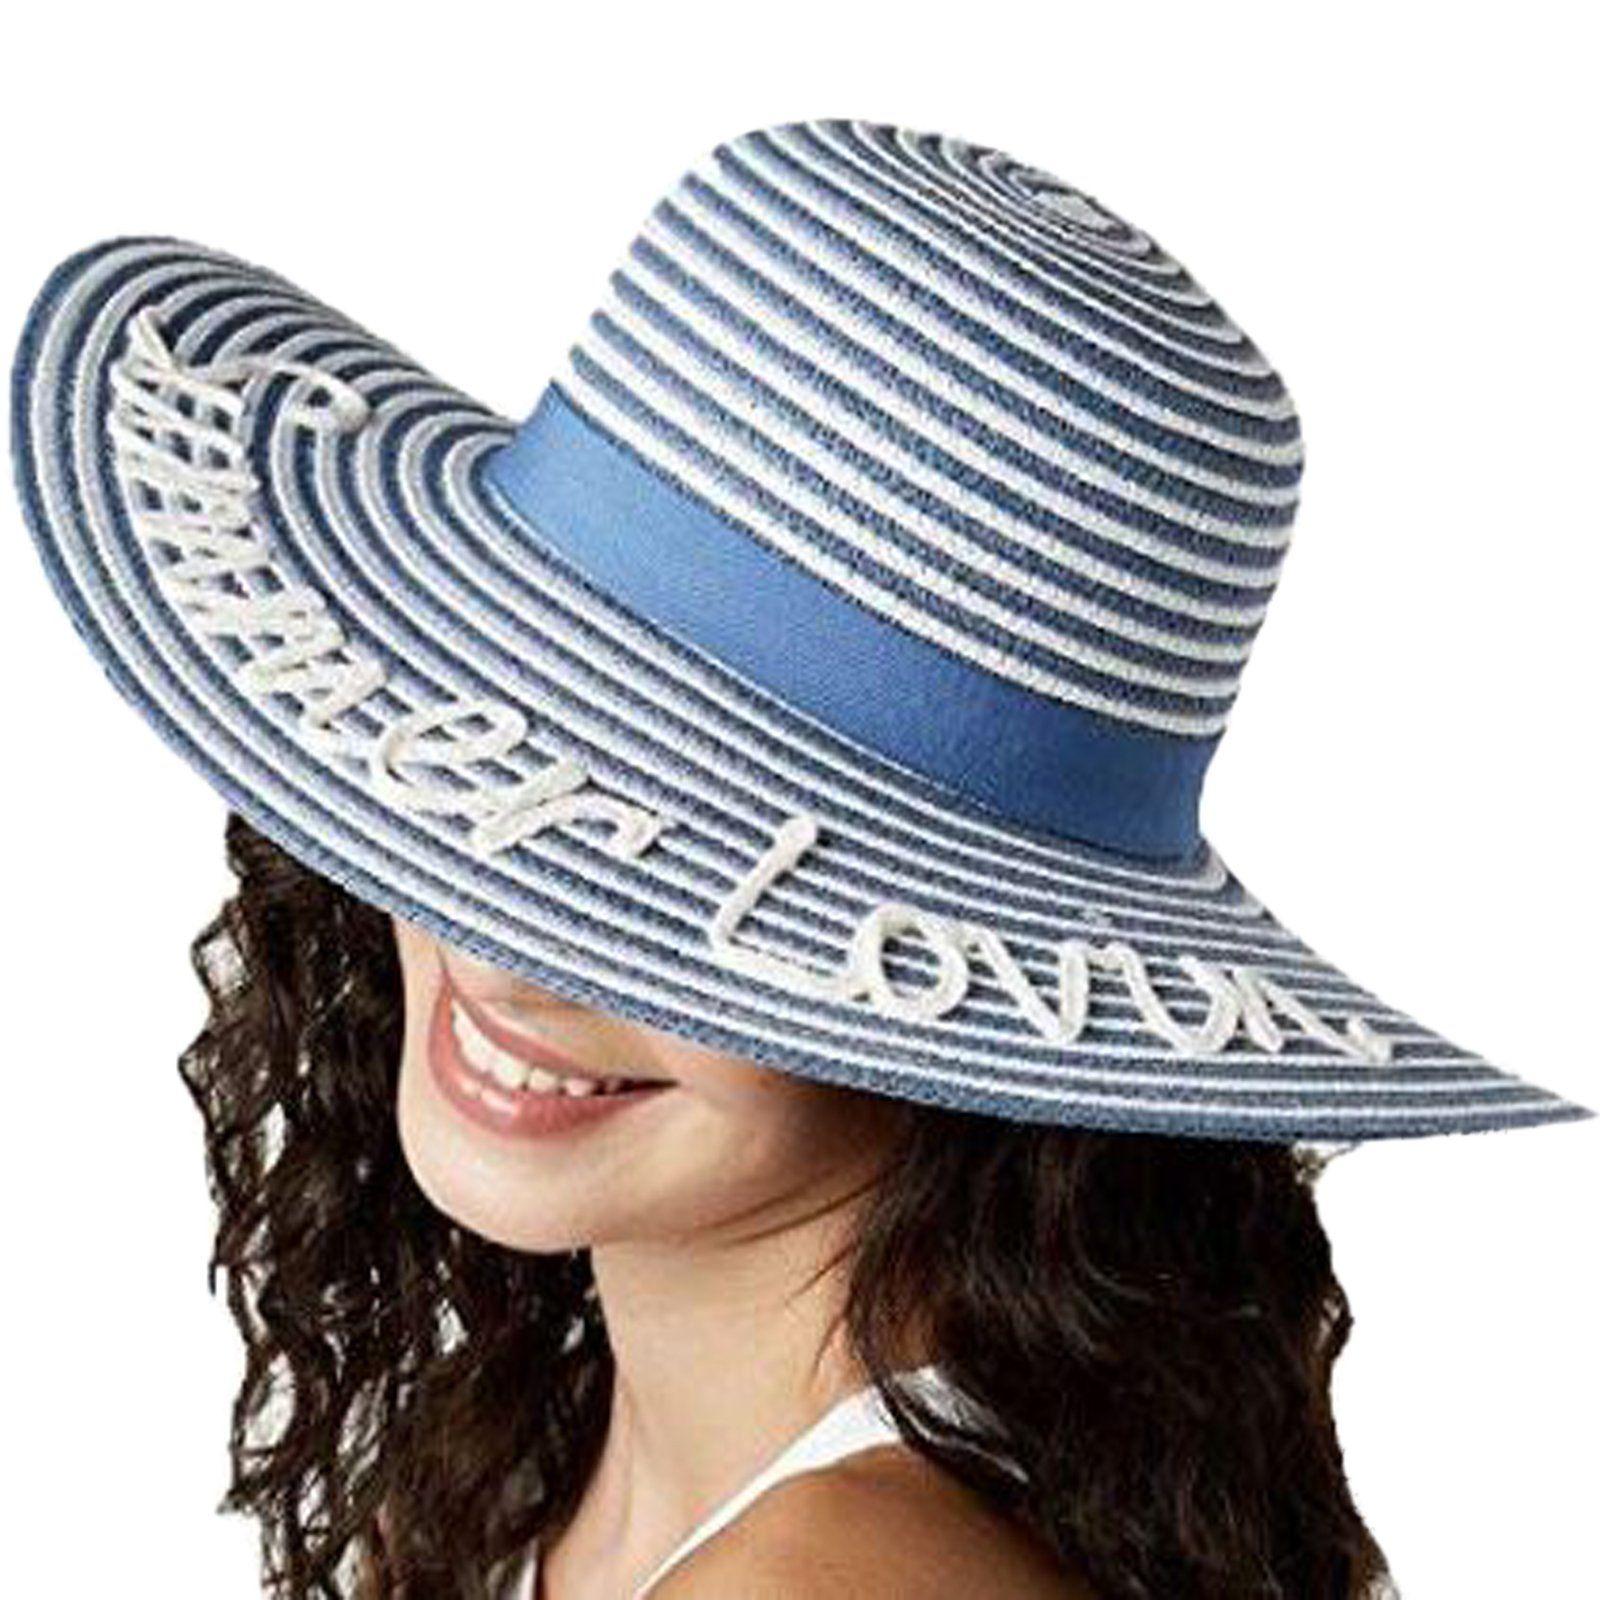 c2fdfdeee5de91 August Hat Co. Womens Summer Lovin' Floppy Hat (Blue/White, One Size ...